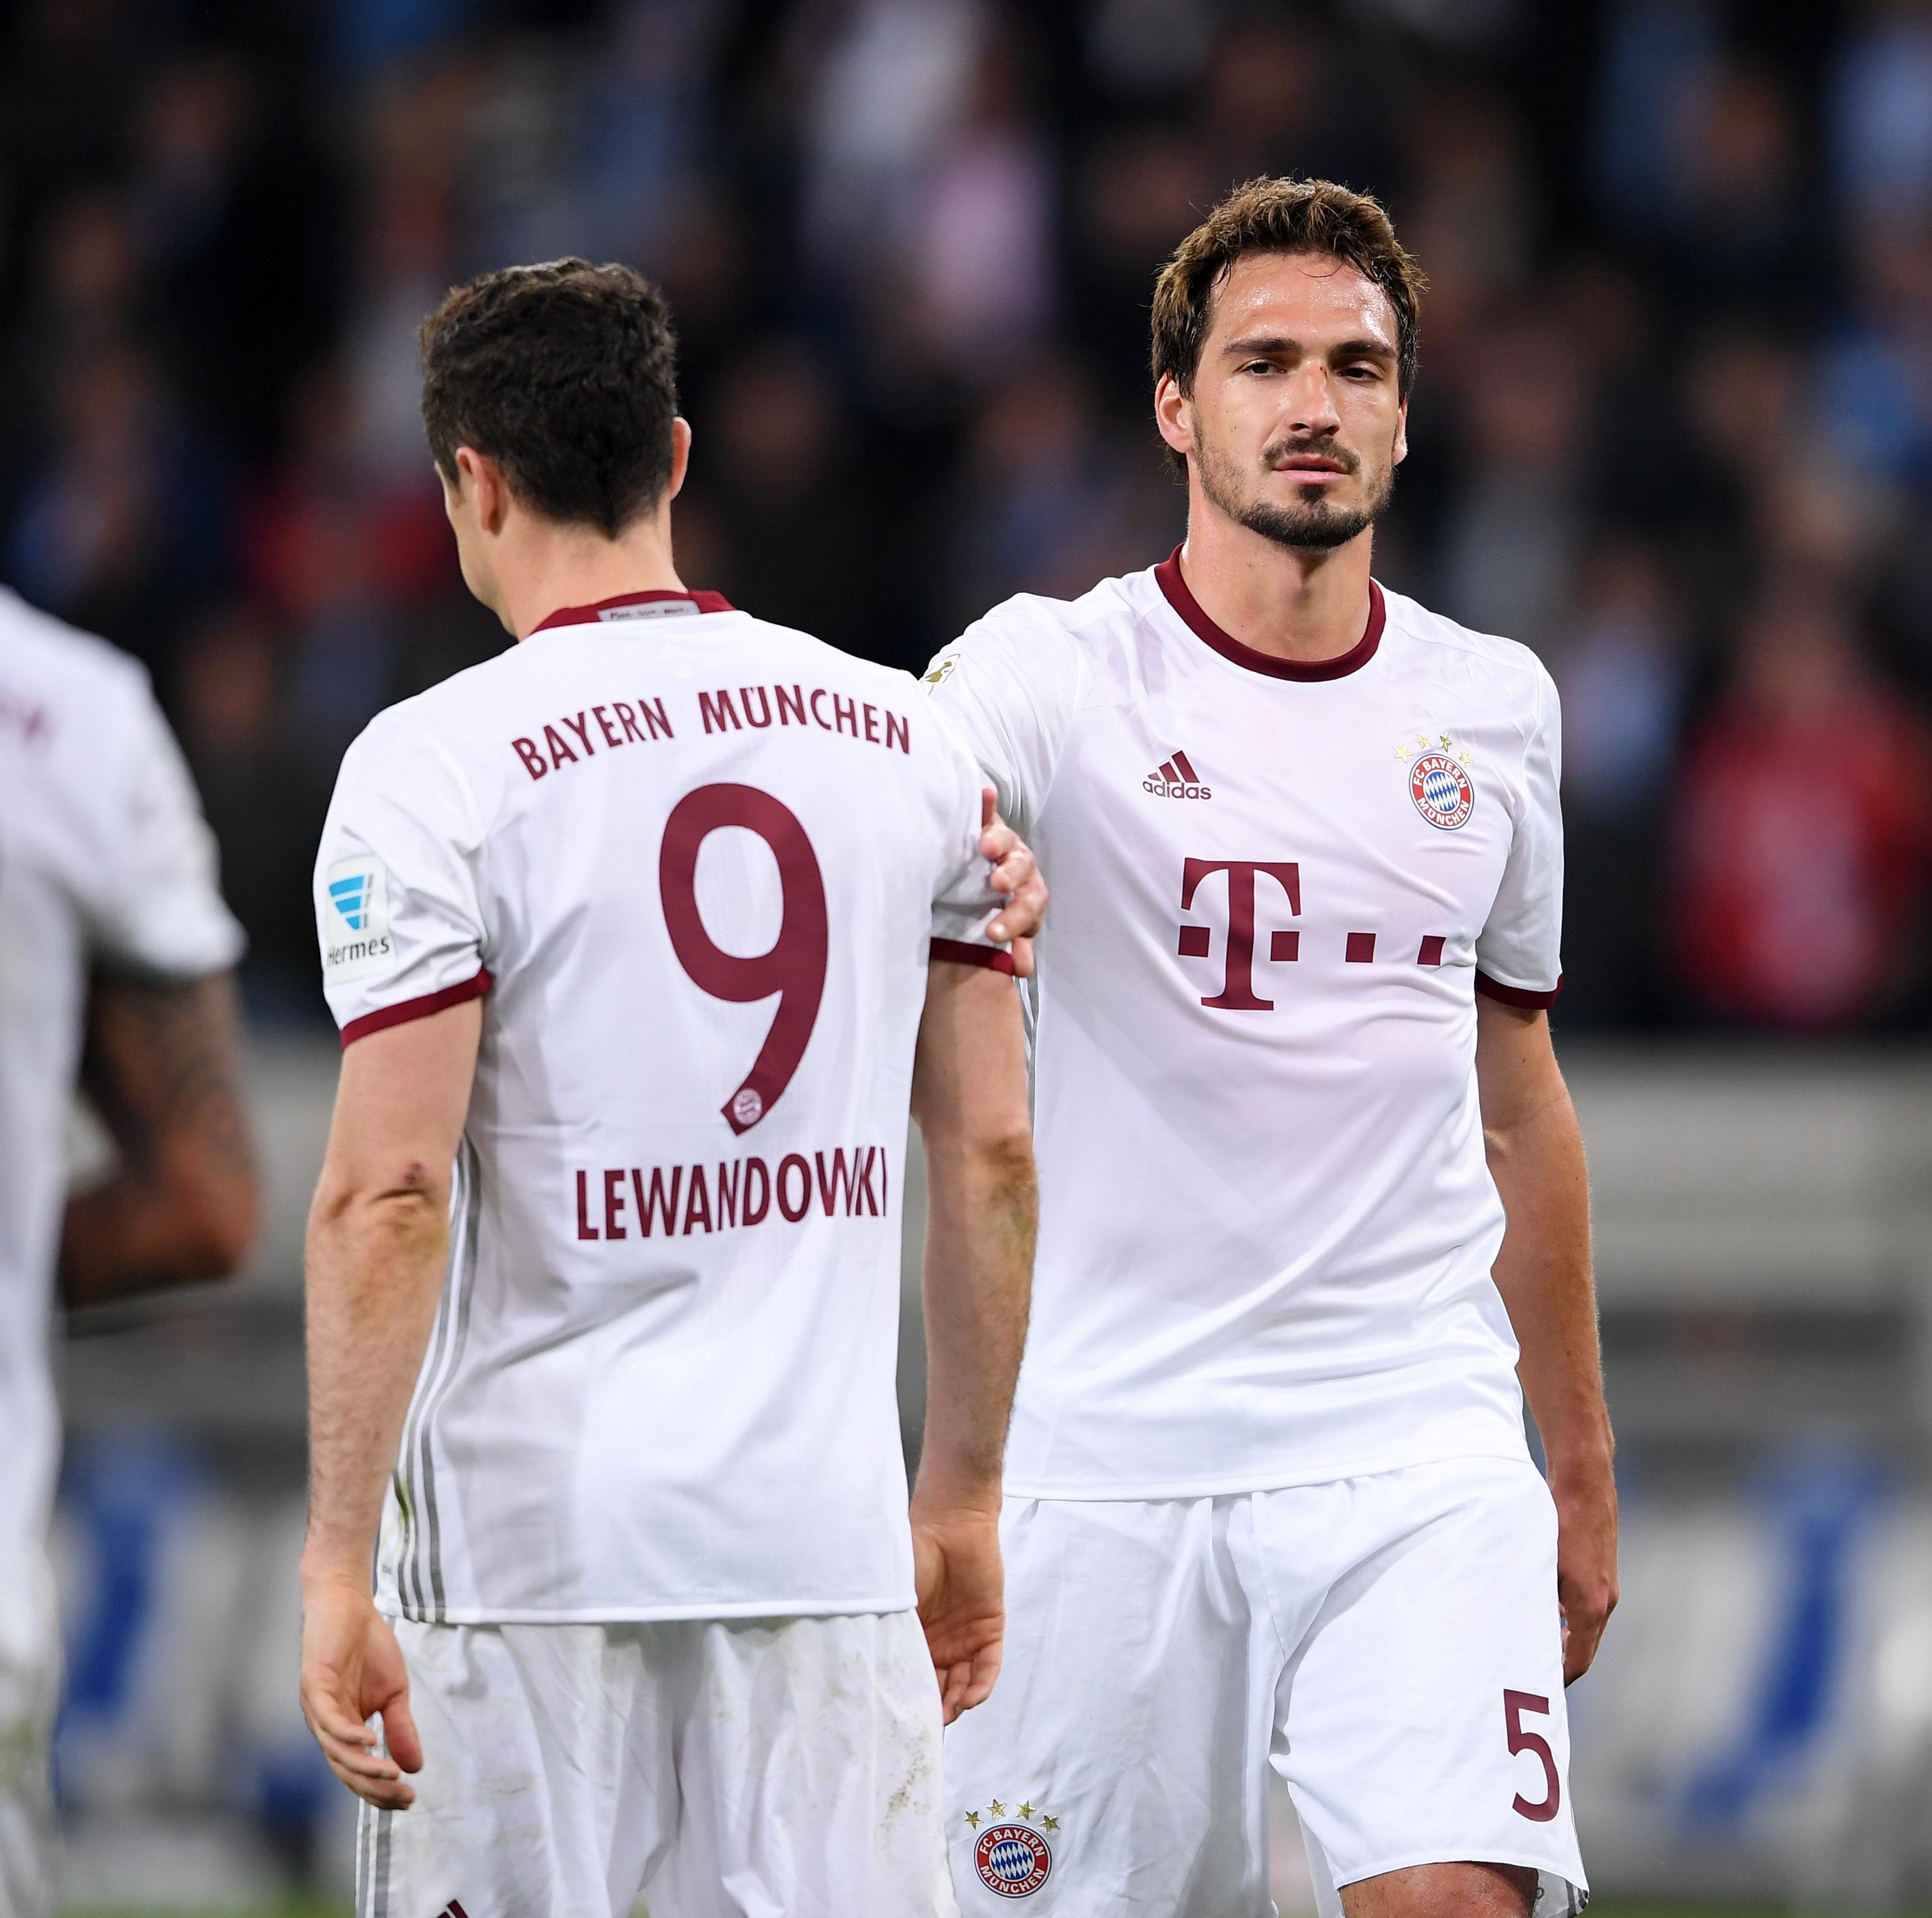 Fussball 1. Bundesliga Saison 2016/2017 27. Spieltag TSG 1899 Hoffenheim - FC Bayern Muenchen Enttaeuschung FC Bayern Muenchen; Mats Hummels (re) und Robert Lewandowski.